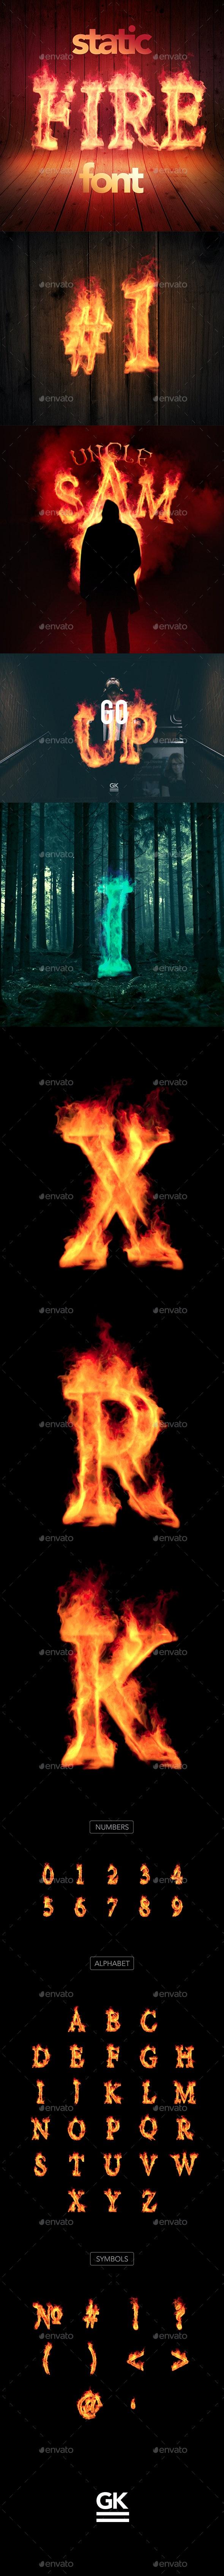 Fire Font / Alphabet -Static Version - Text 3D Renders